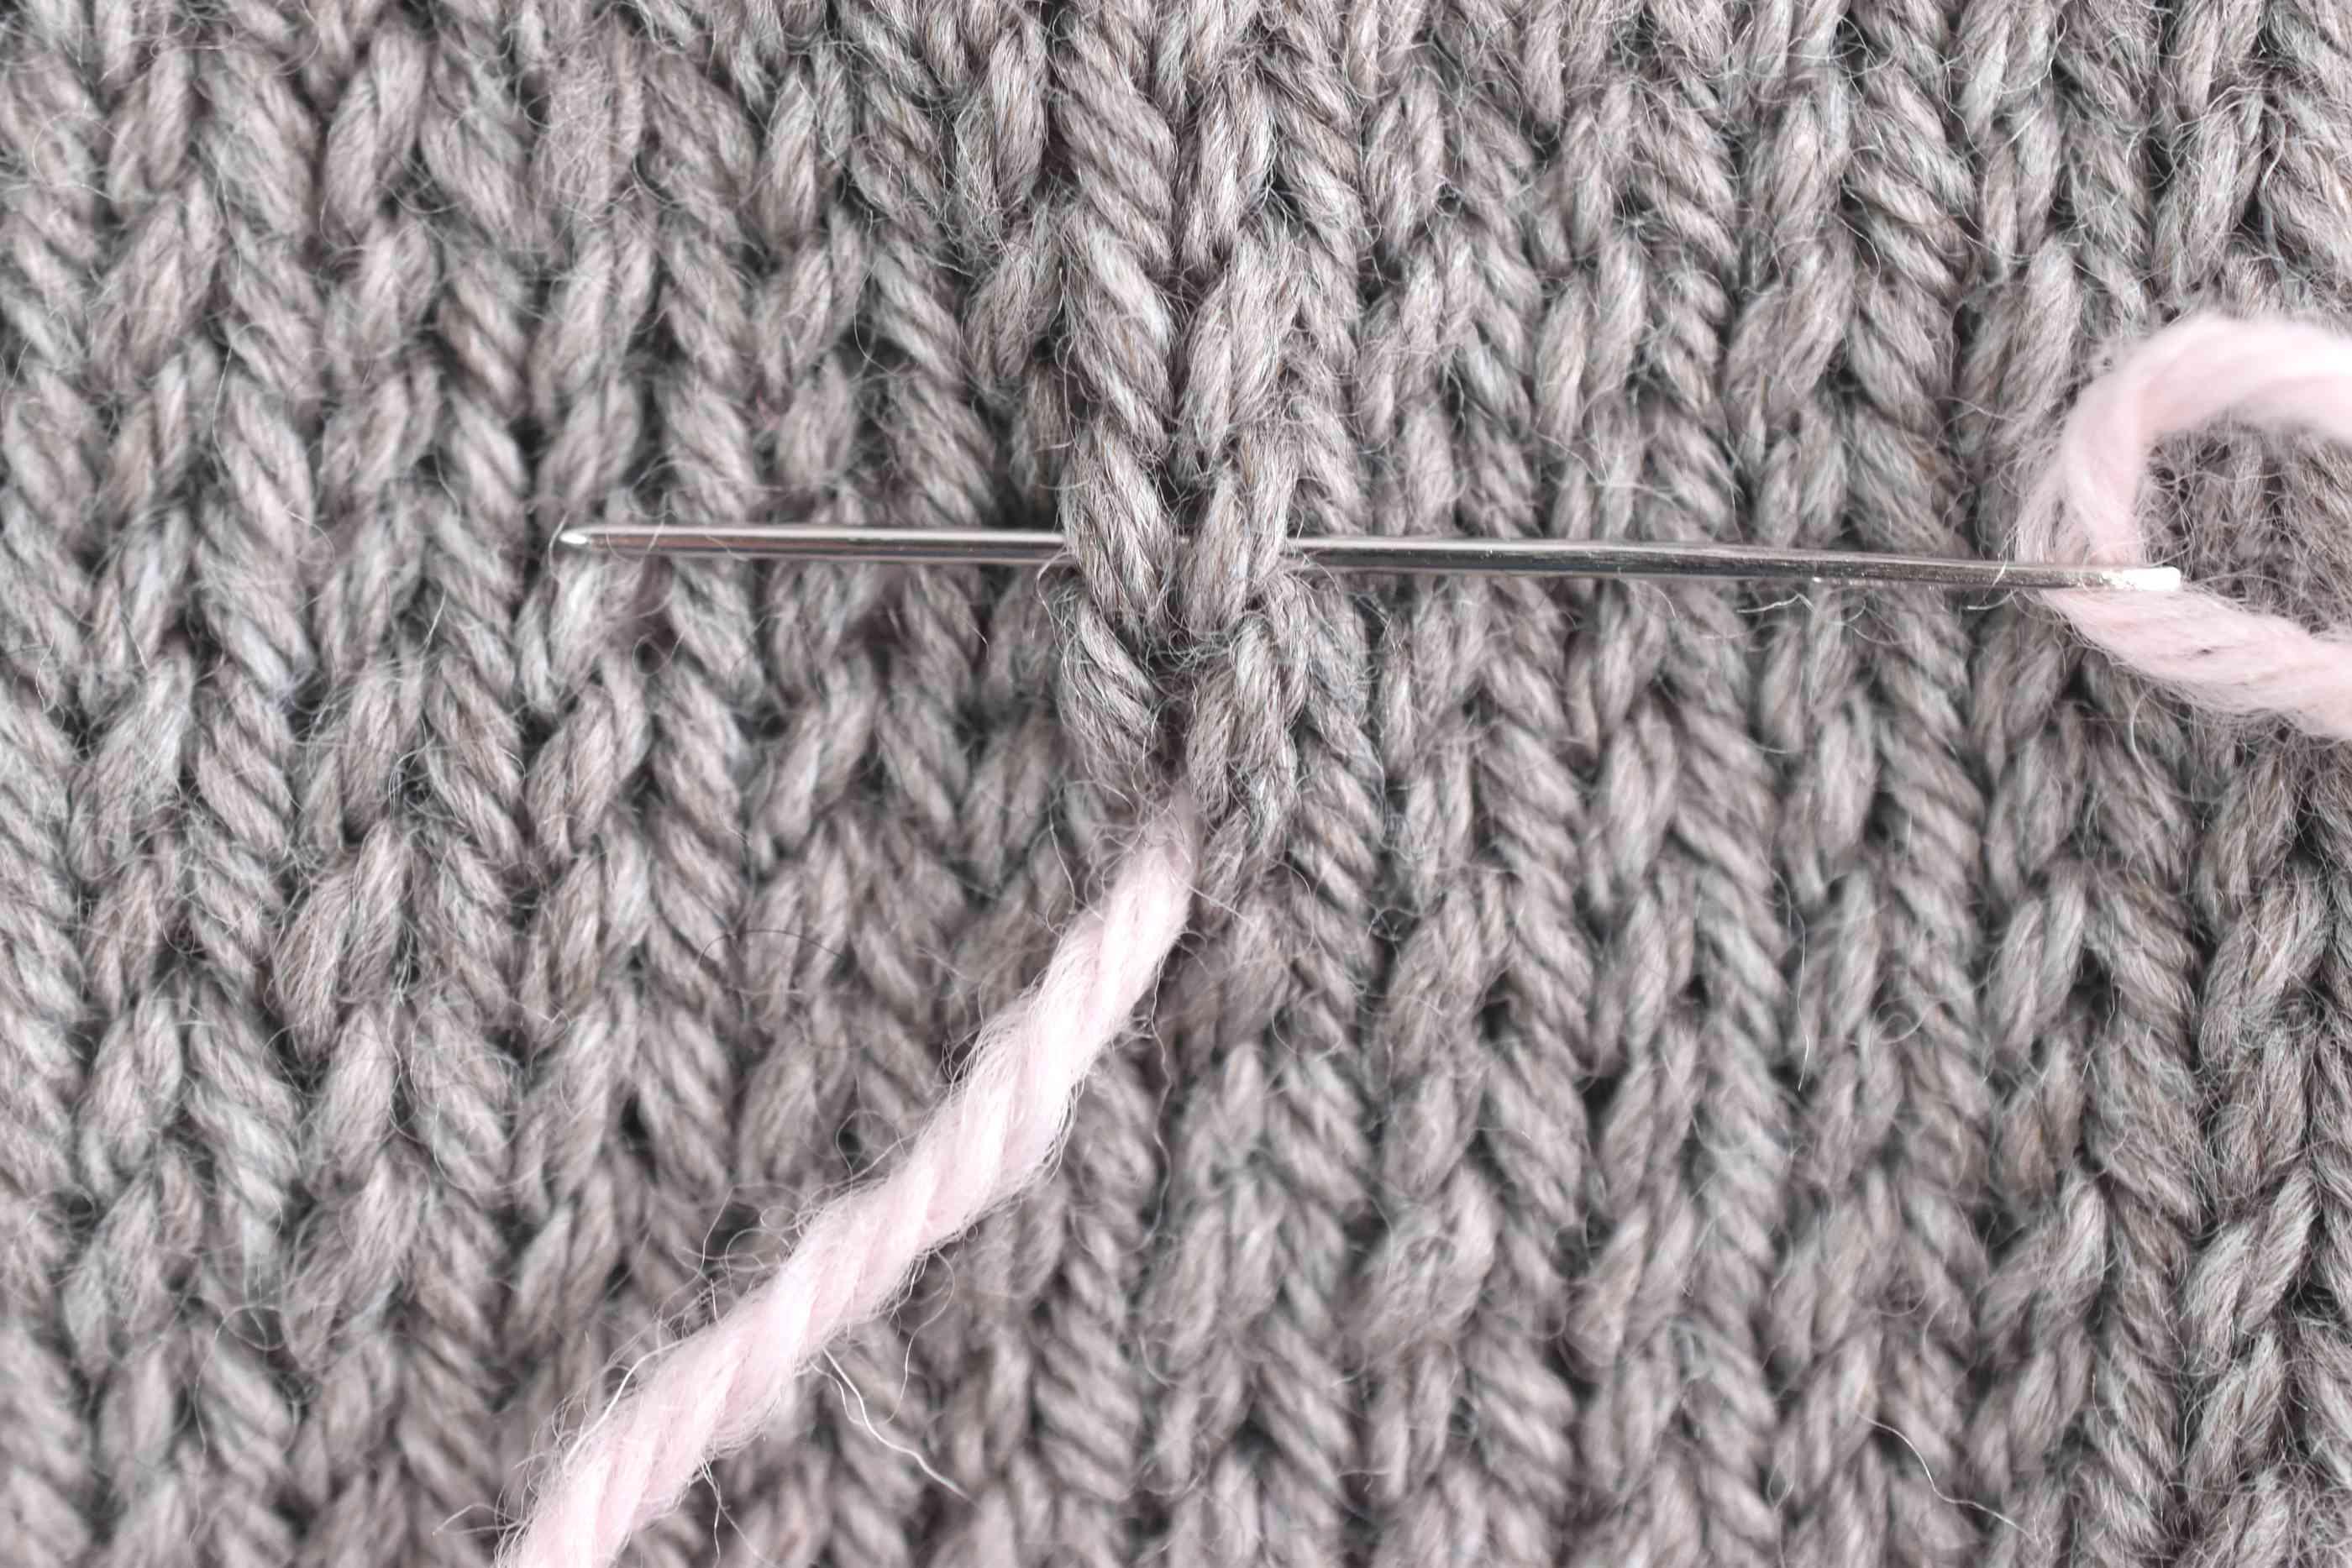 Starting the First Duplicate Stitch